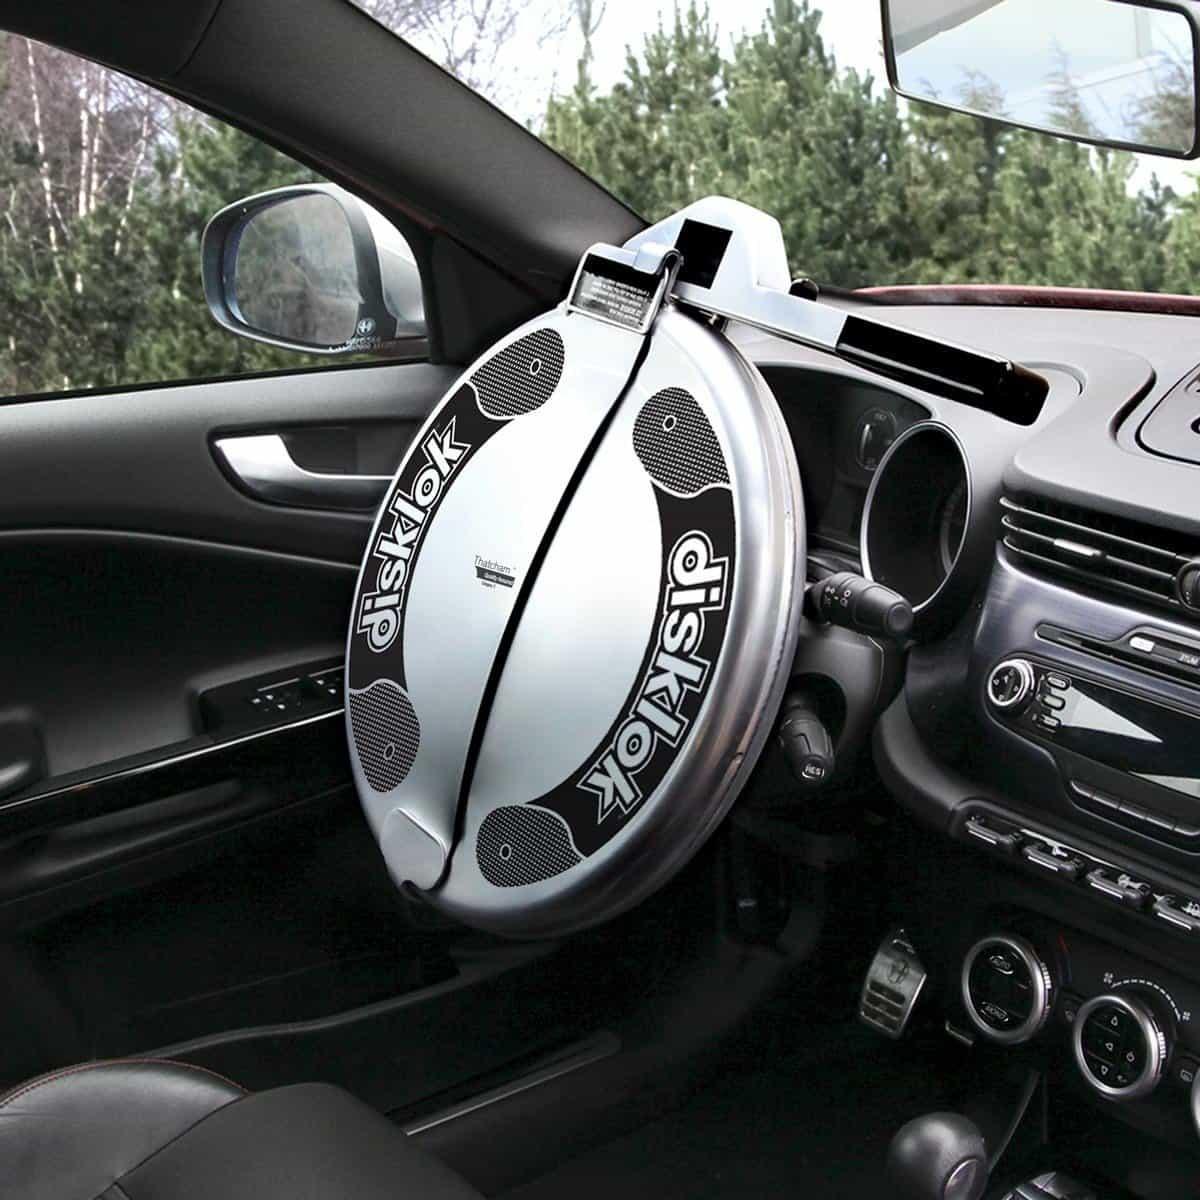 Image source:  https://www.safemonk.com/guides/steering-wheel-locks/